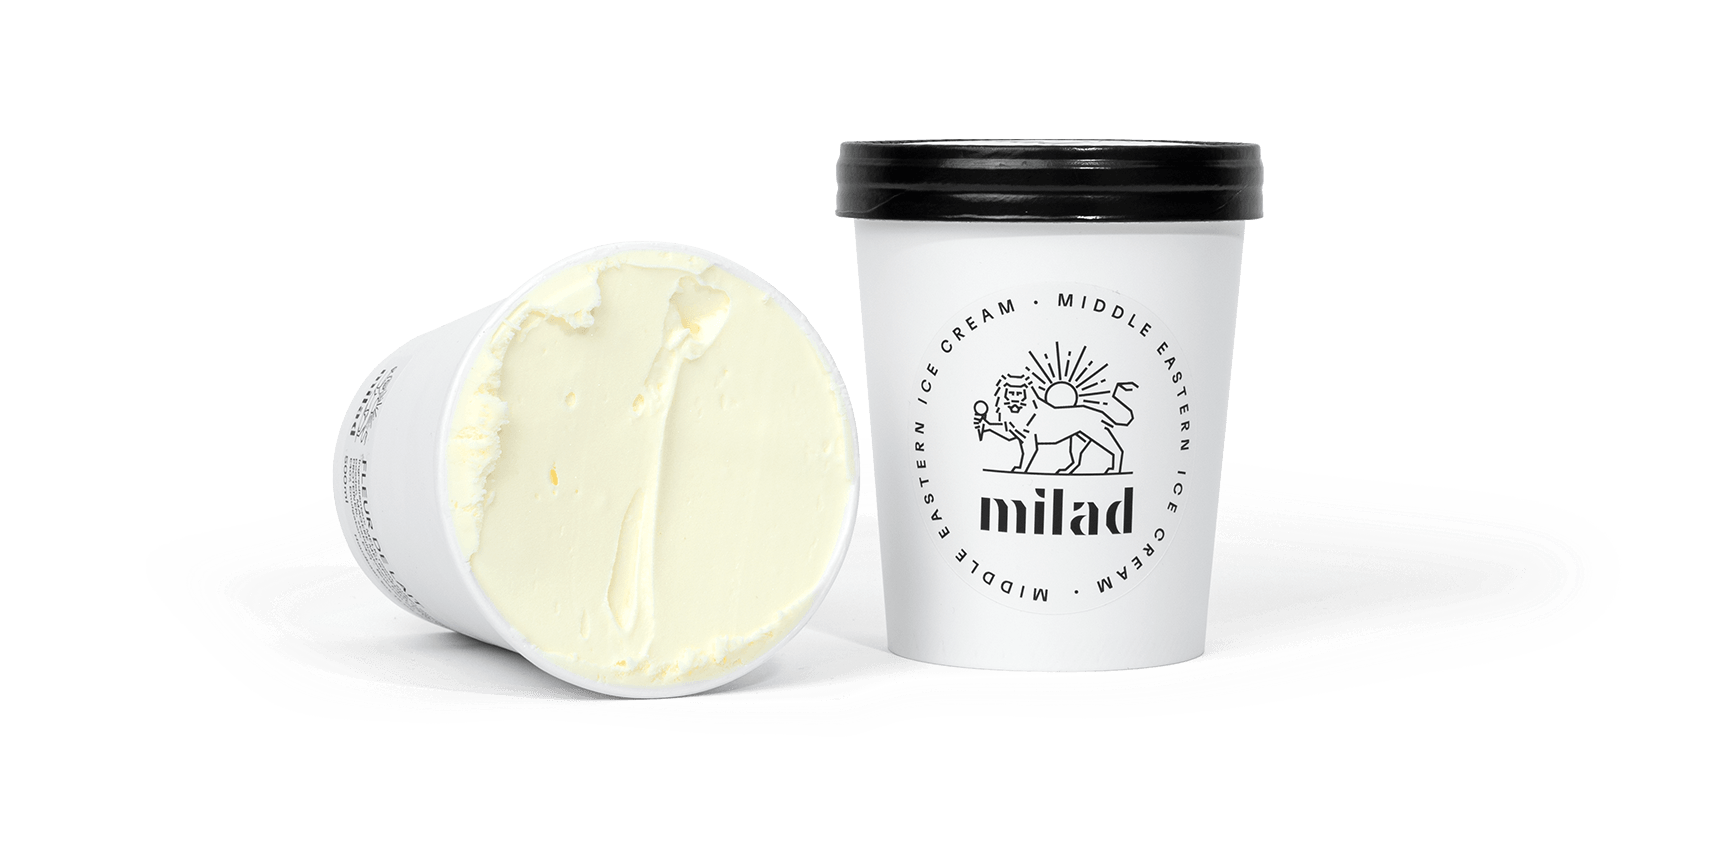 packshot of fleur de lait ice cream